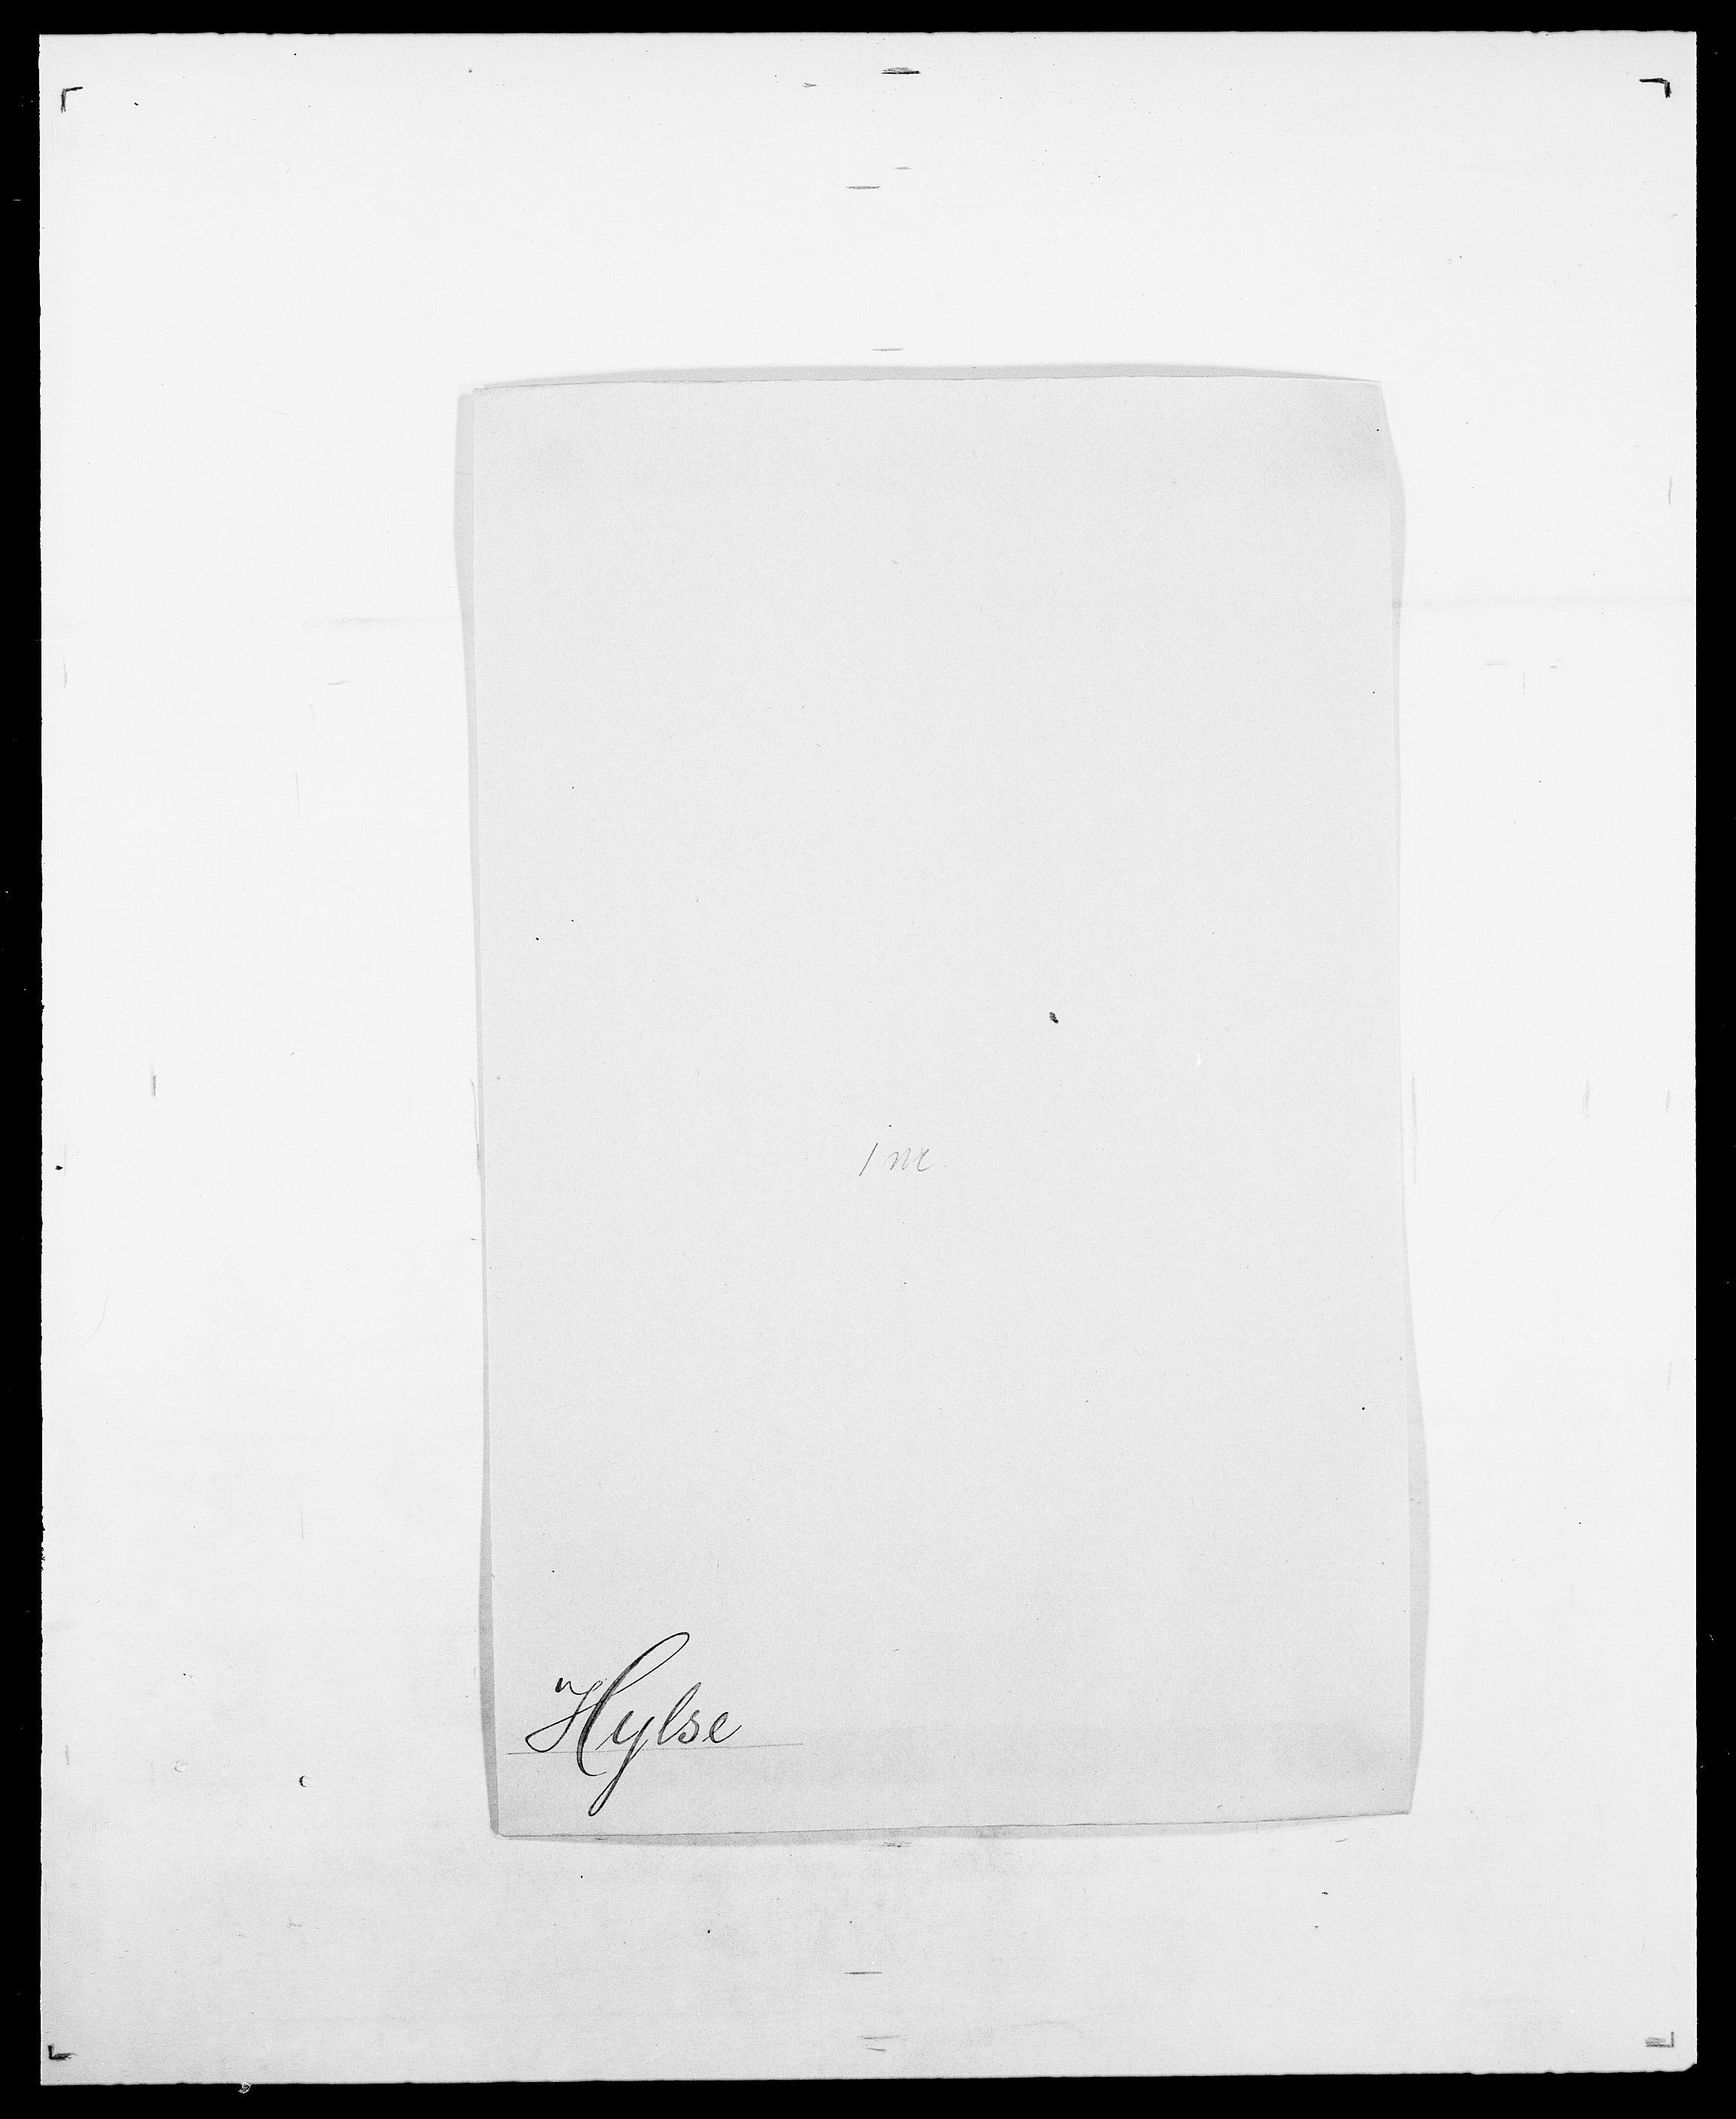 SAO, Delgobe, Charles Antoine - samling, D/Da/L0019: van der Hude - Joys, s. 278